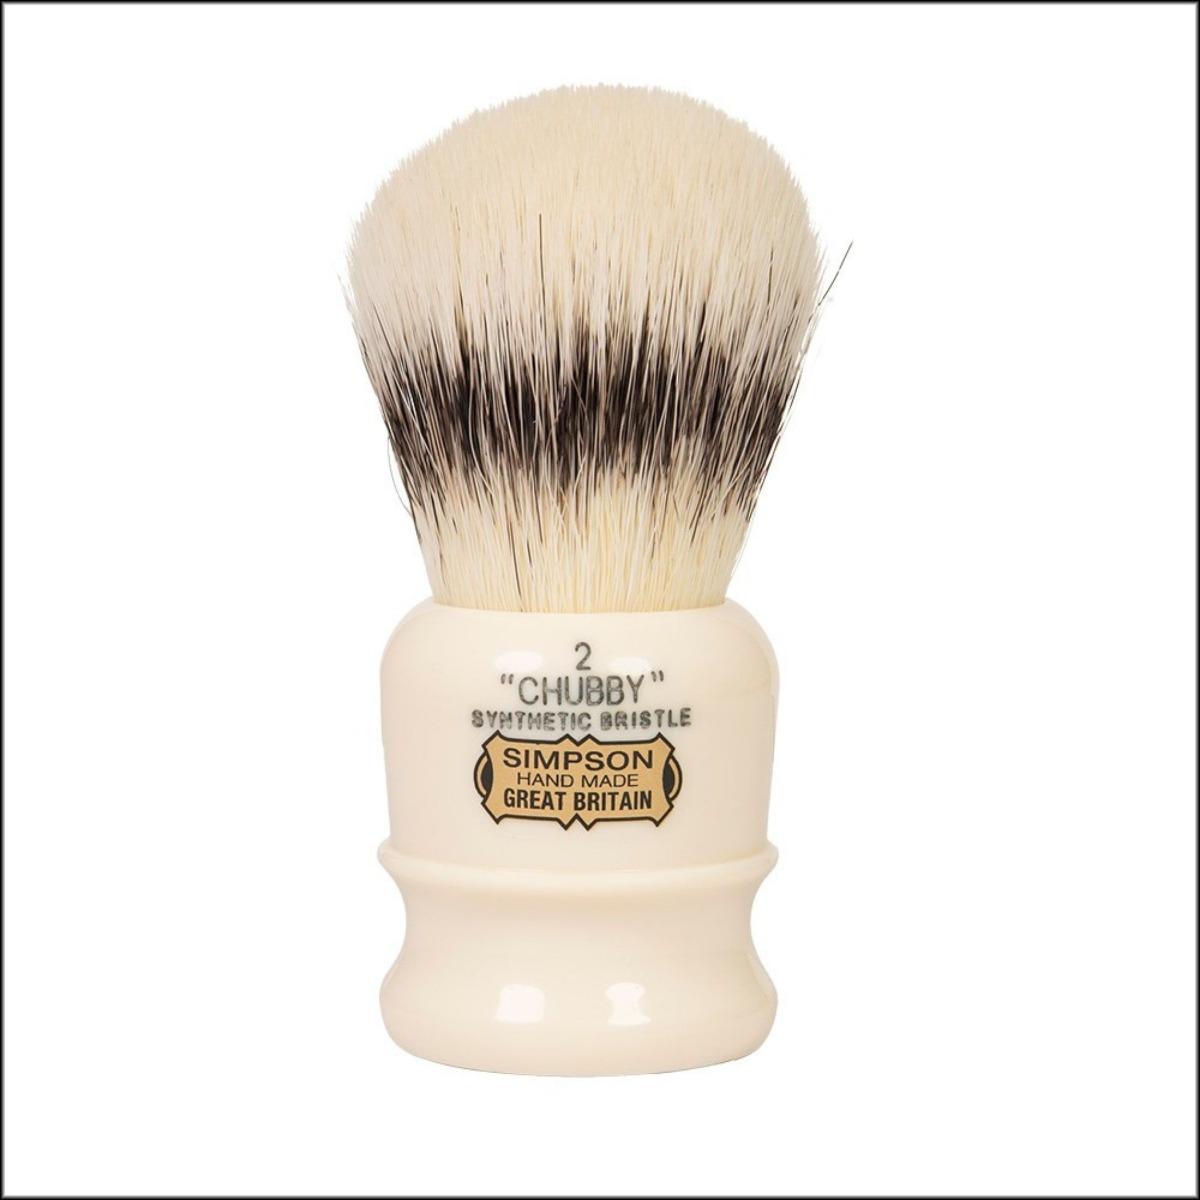 Simpson Chubby 2 Synthetic Shaving Brush